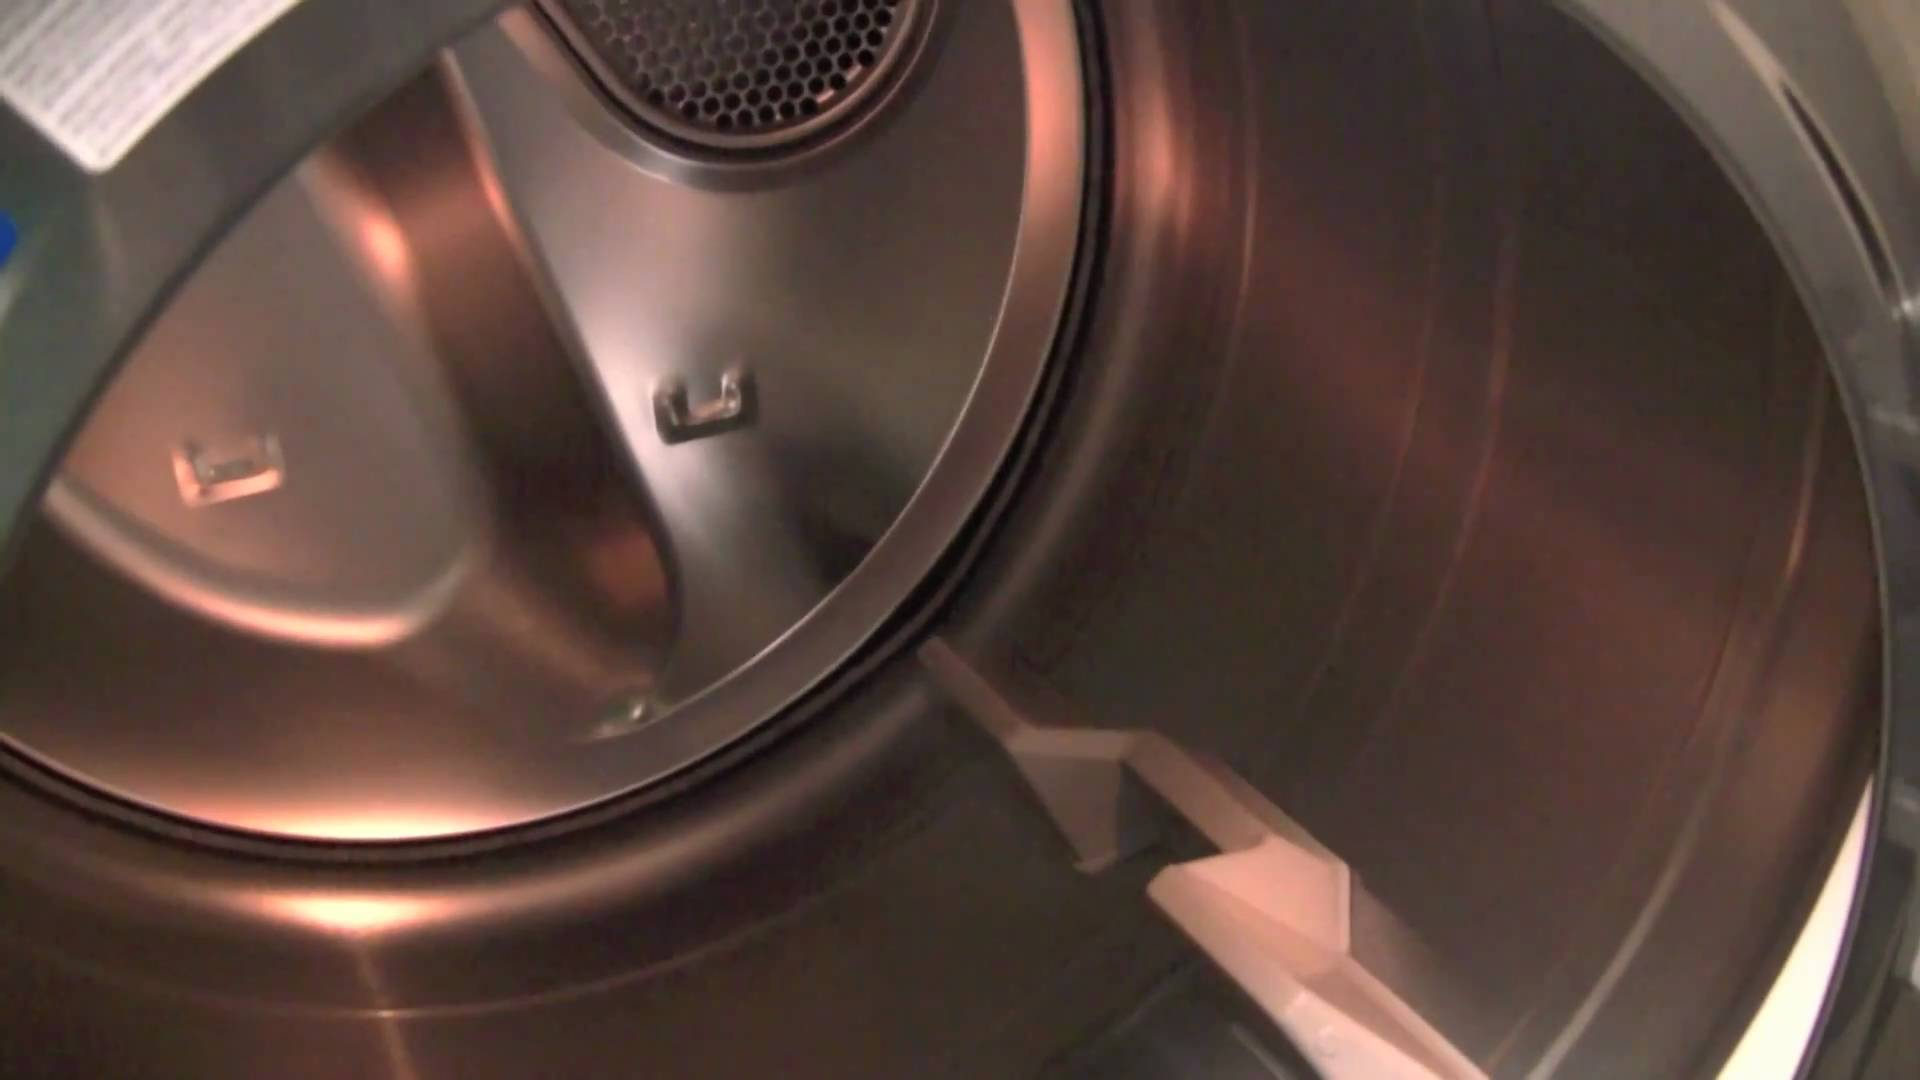 Samsung Appliances Customer Service Complaints Department